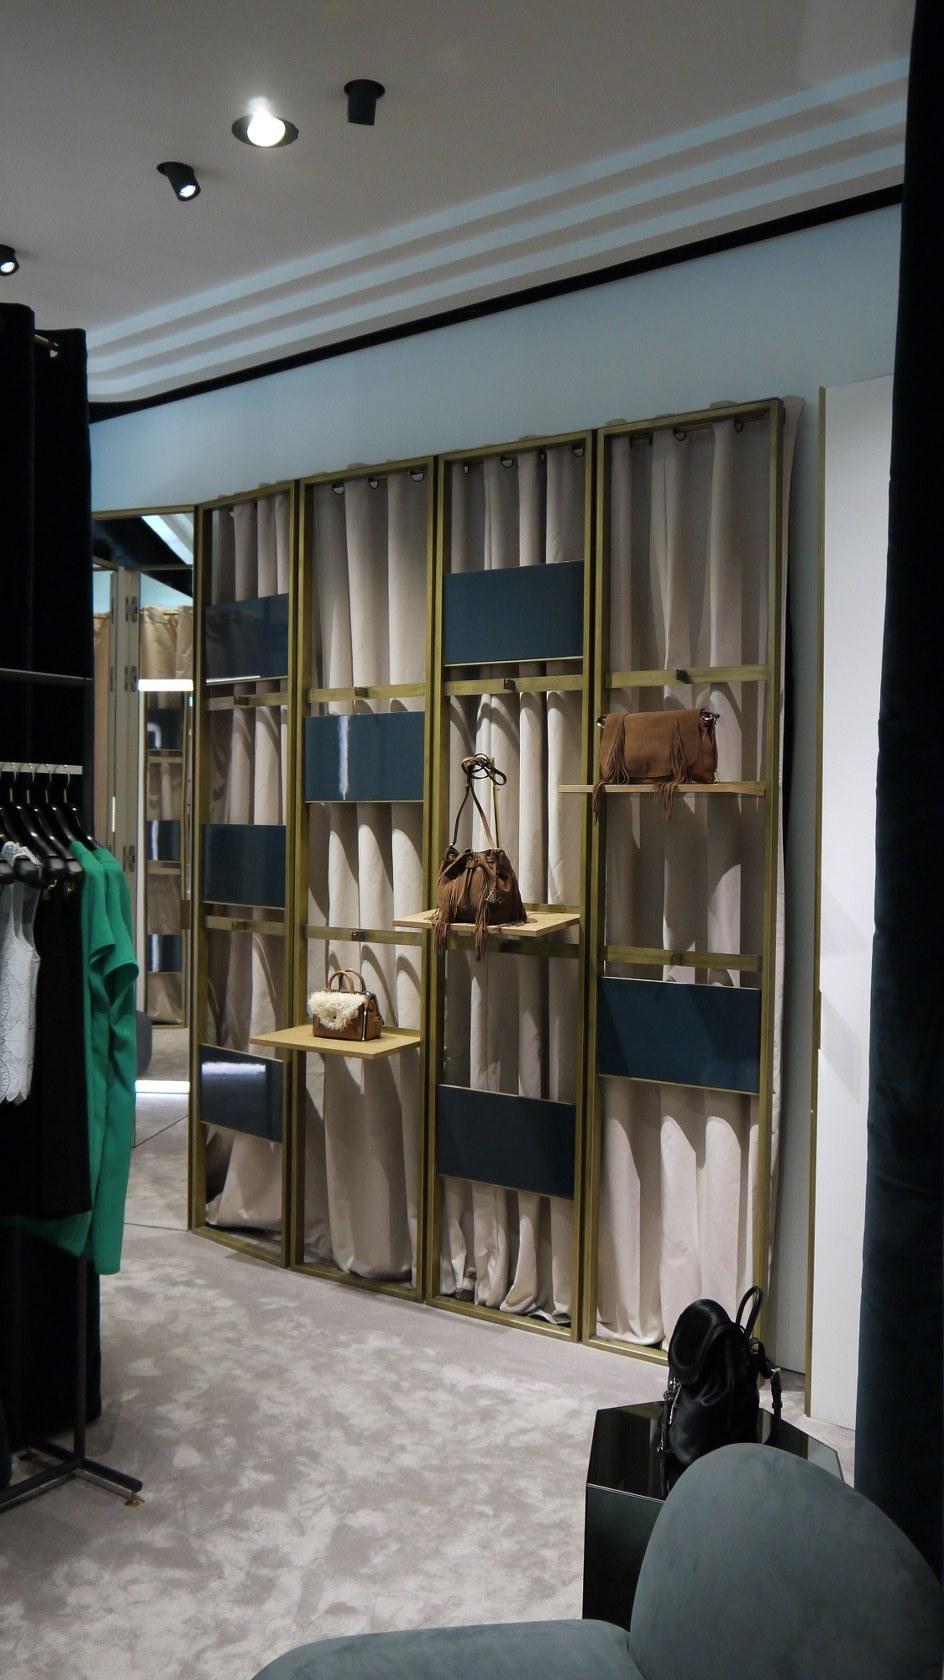 Display Shelves_1680x944.jpg